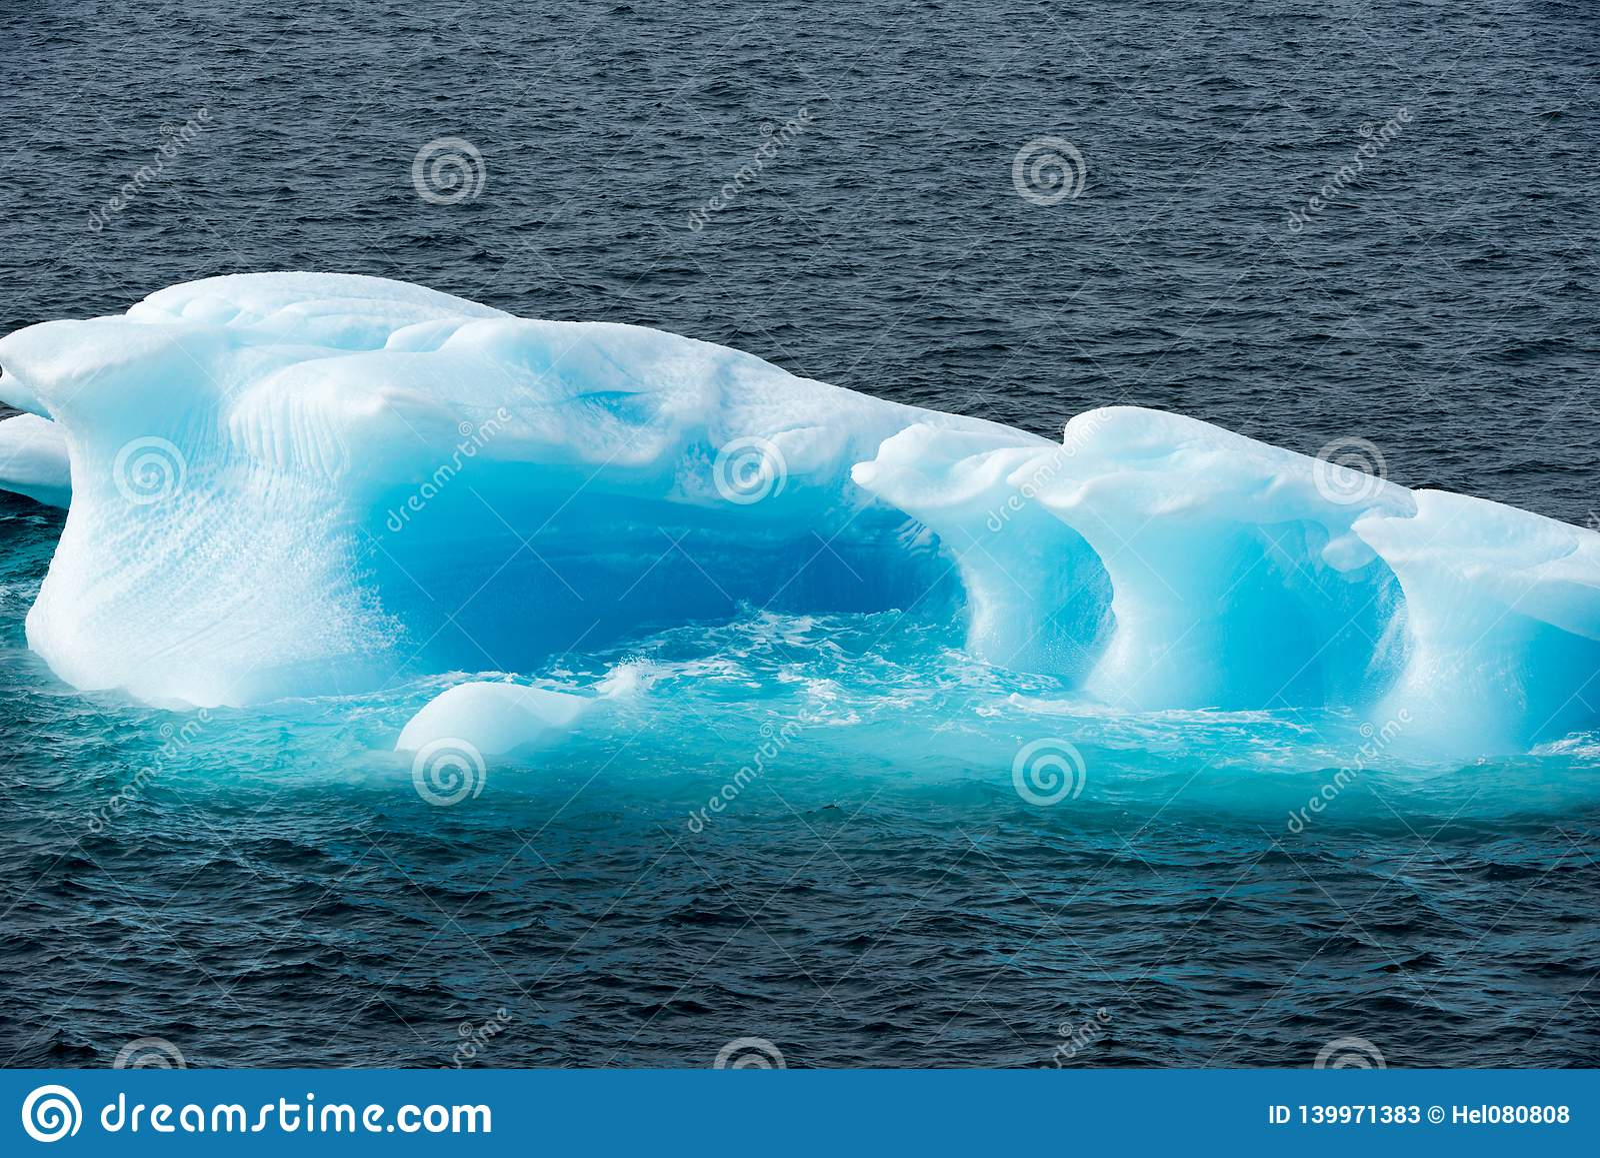 Glanzende turkooise Ijsberg die door turkoois glanzend water, Groenland wordt omringd